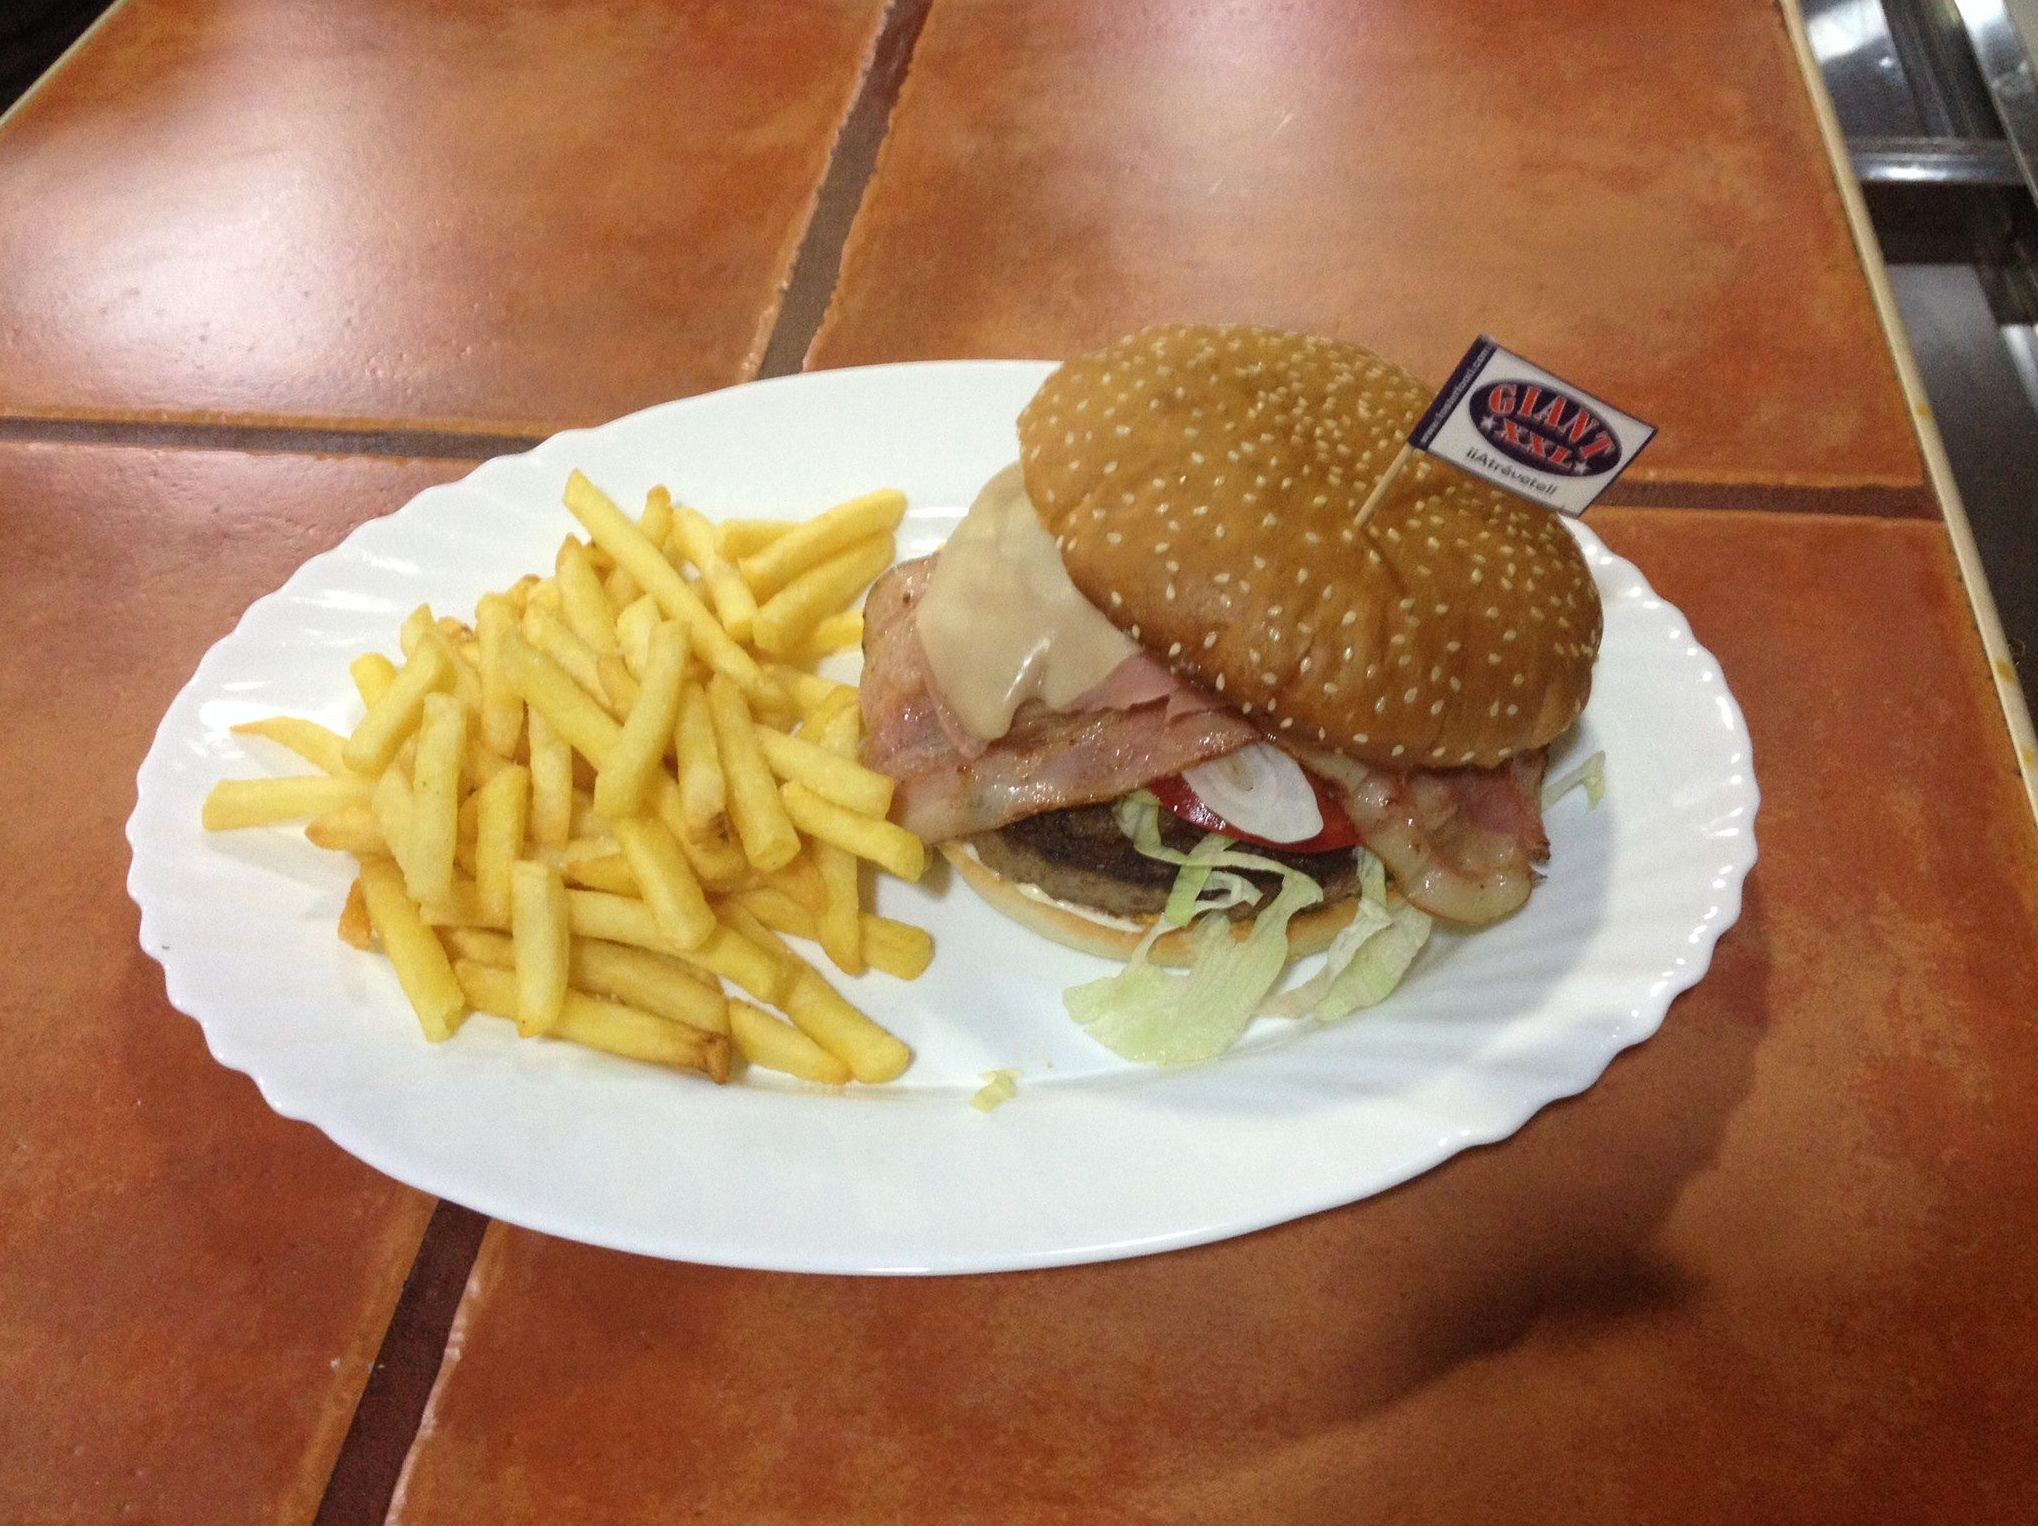 Menú de hamburguesa con patatas